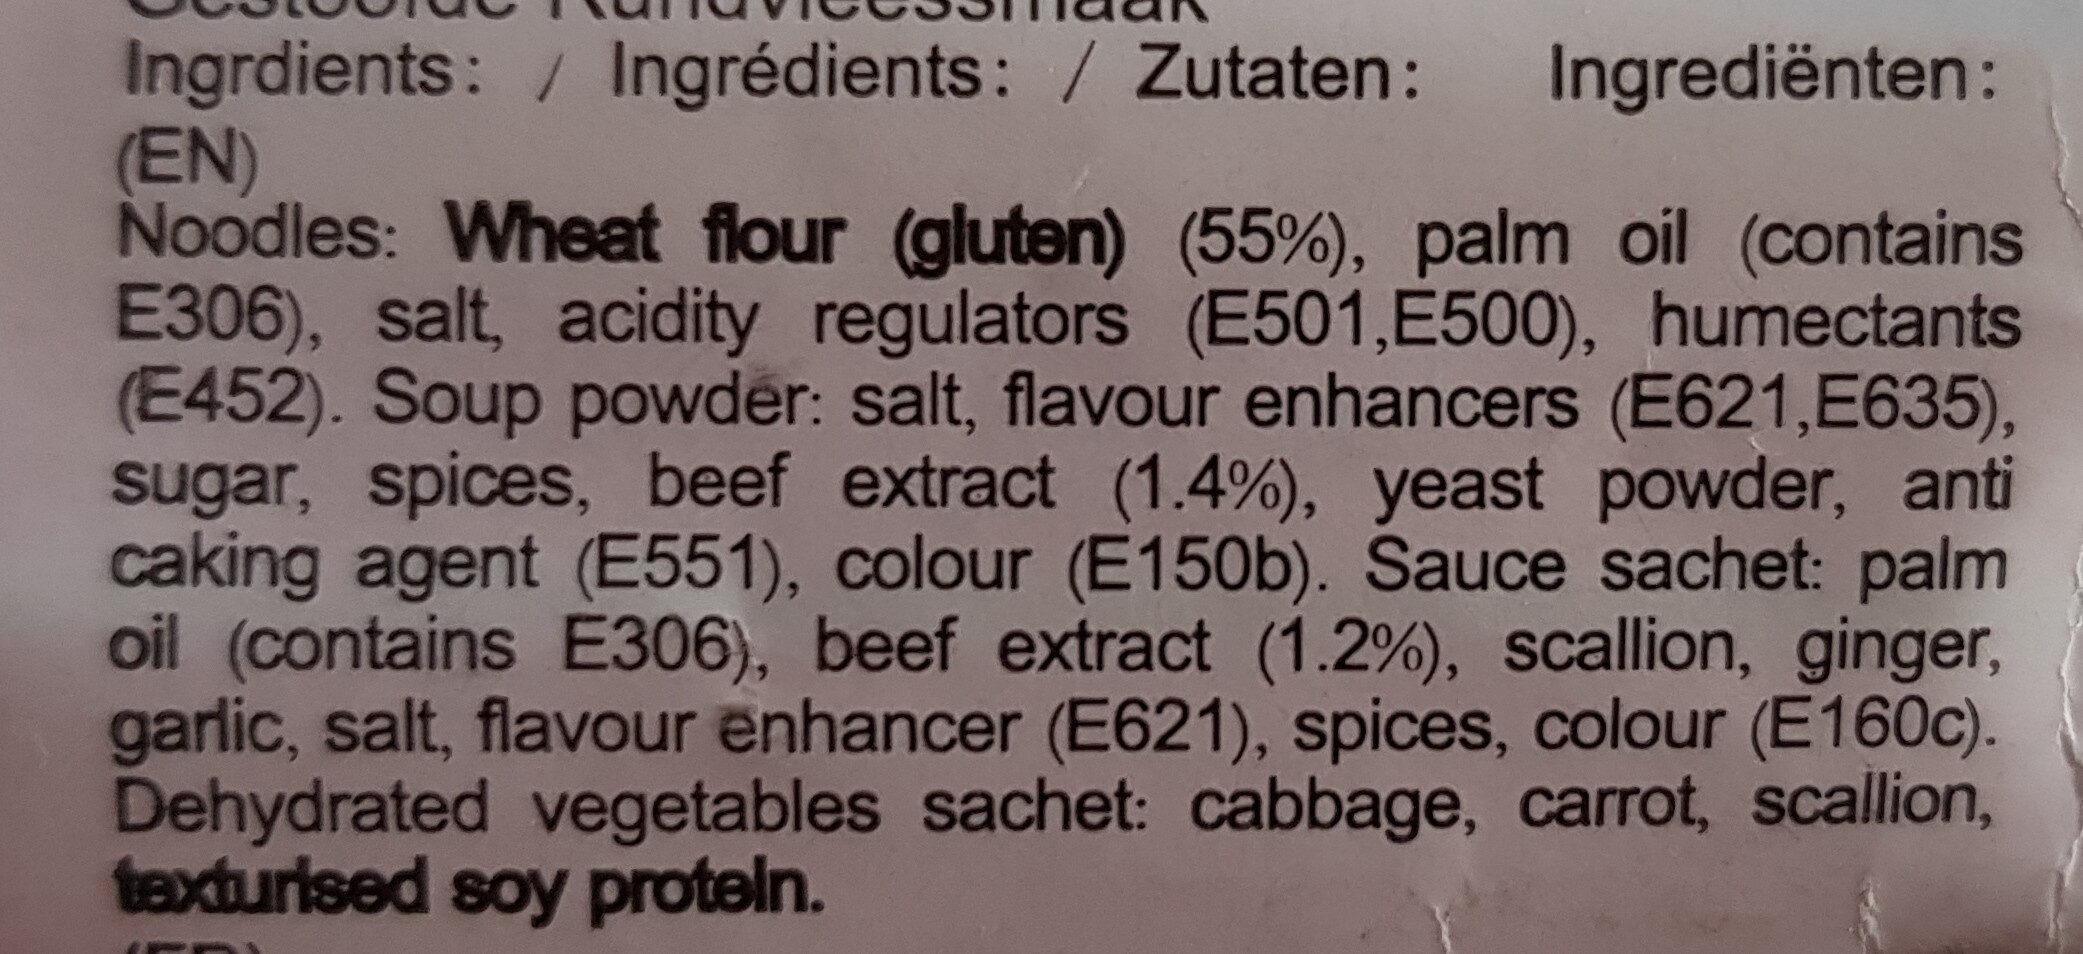 Nouille Saveur Boeuf - Ingredients - en